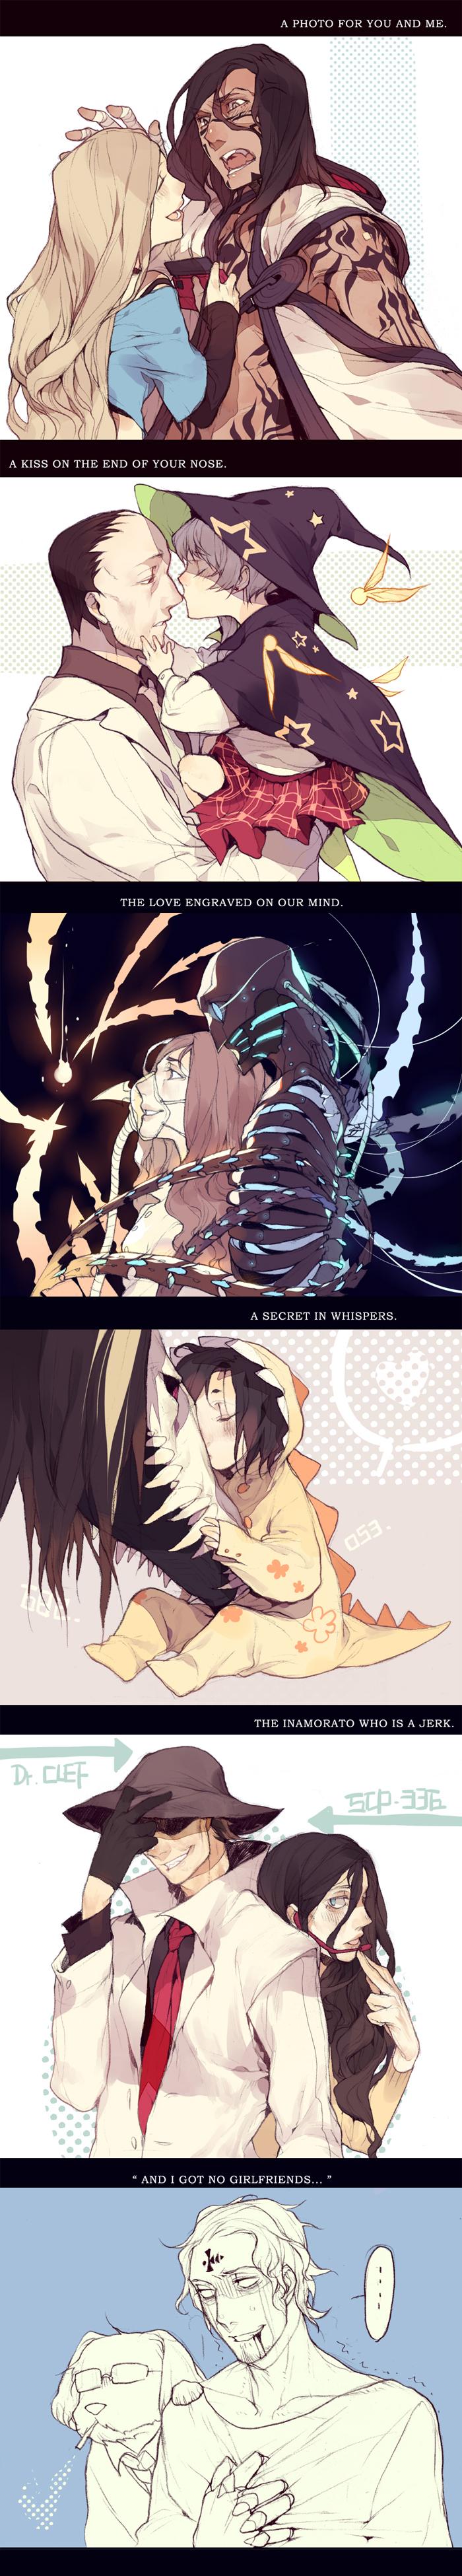 Scp 076 Scp Foundation Zerochan Anime Image Board